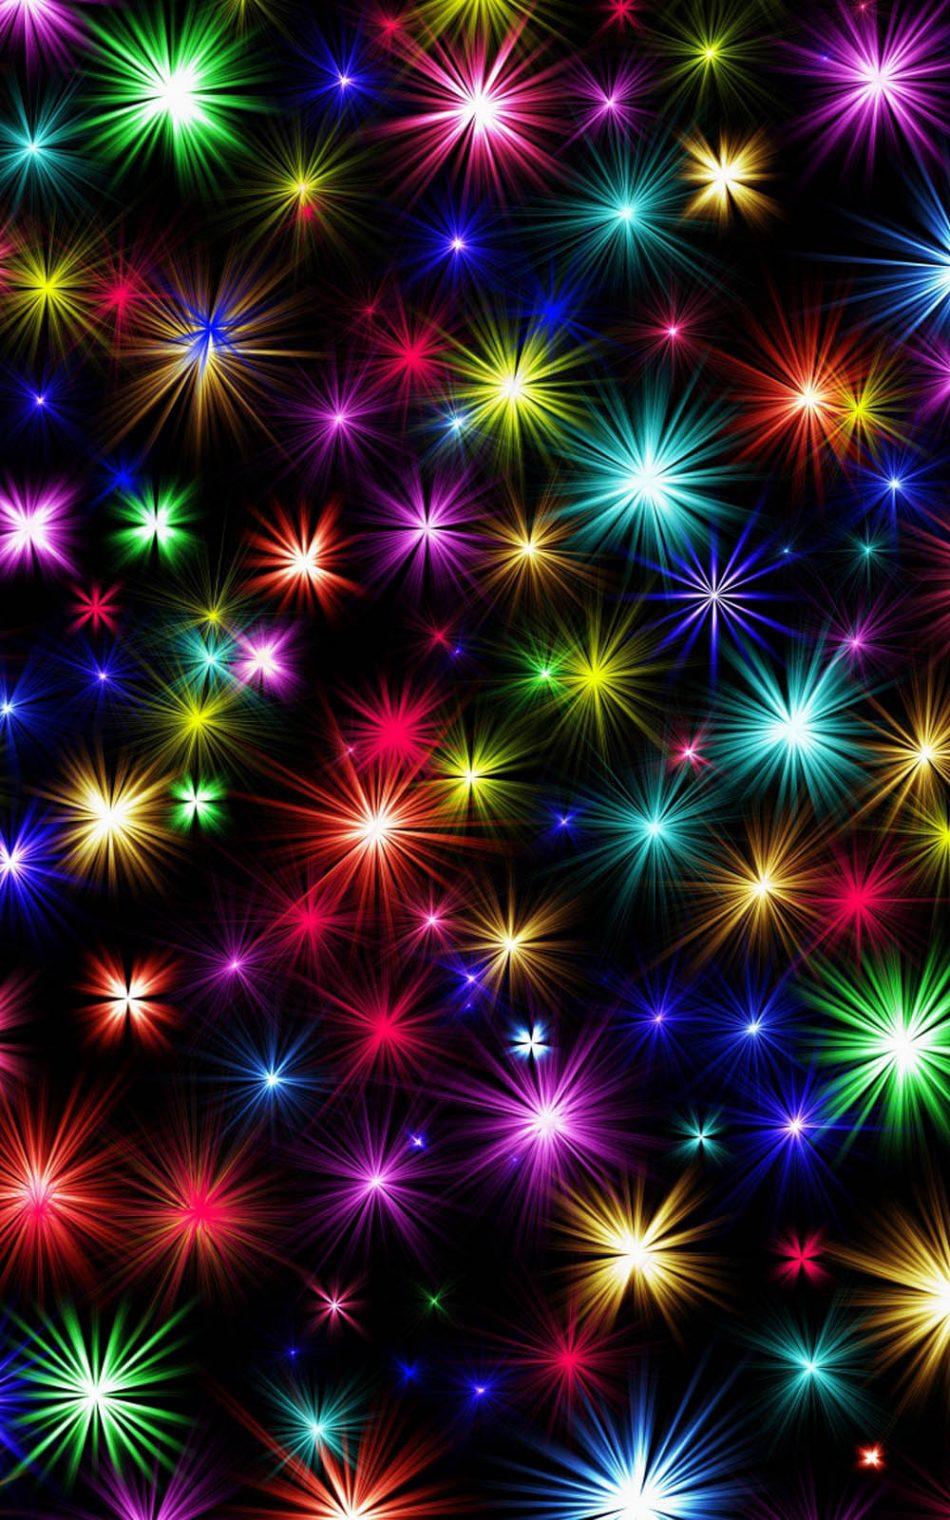 Colorful Shining Fireworks 4k Ultra Hd Mobile Wallpaper